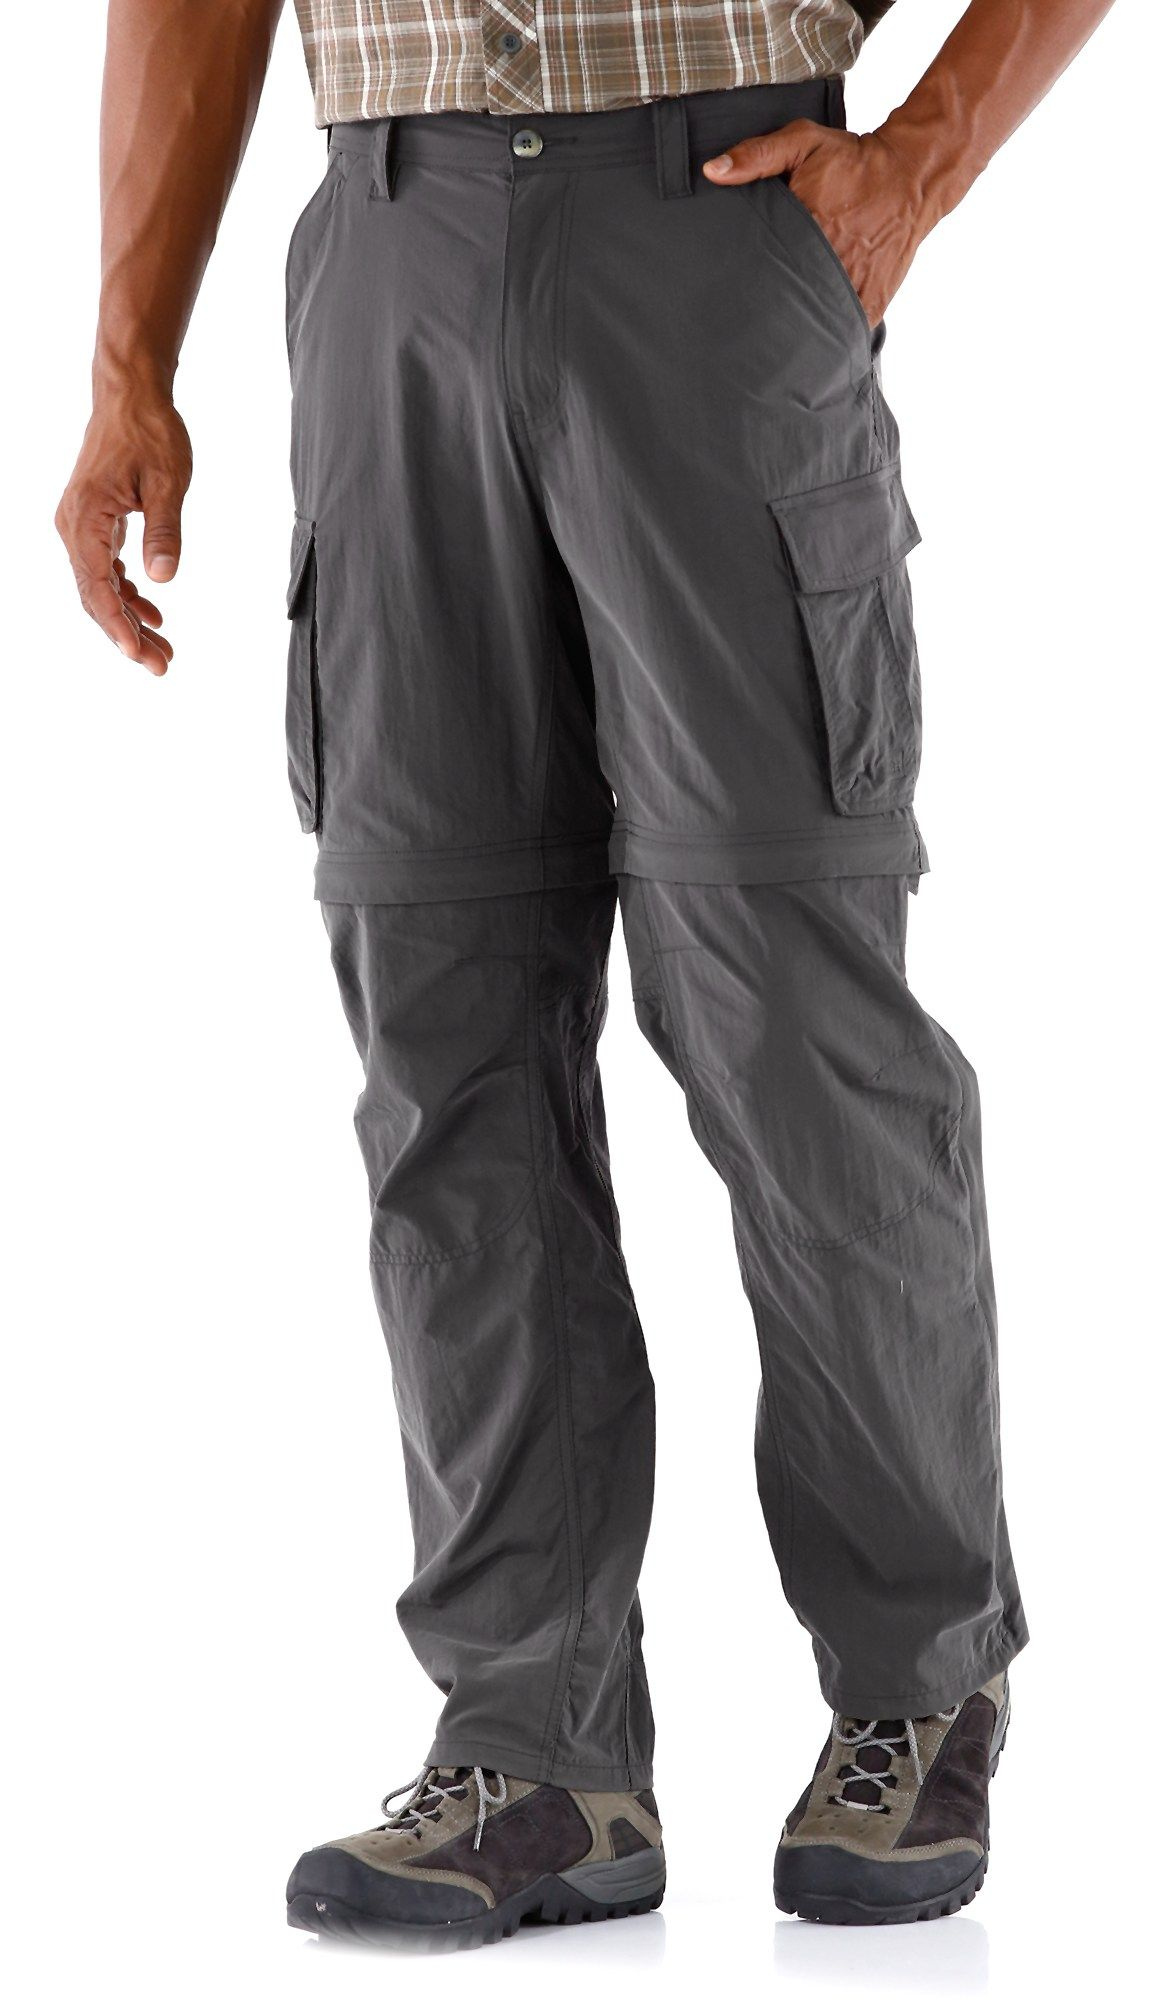 5949a0b0722686 REI Sahara Convertible Pants with No-Sit Zips - Men s 32